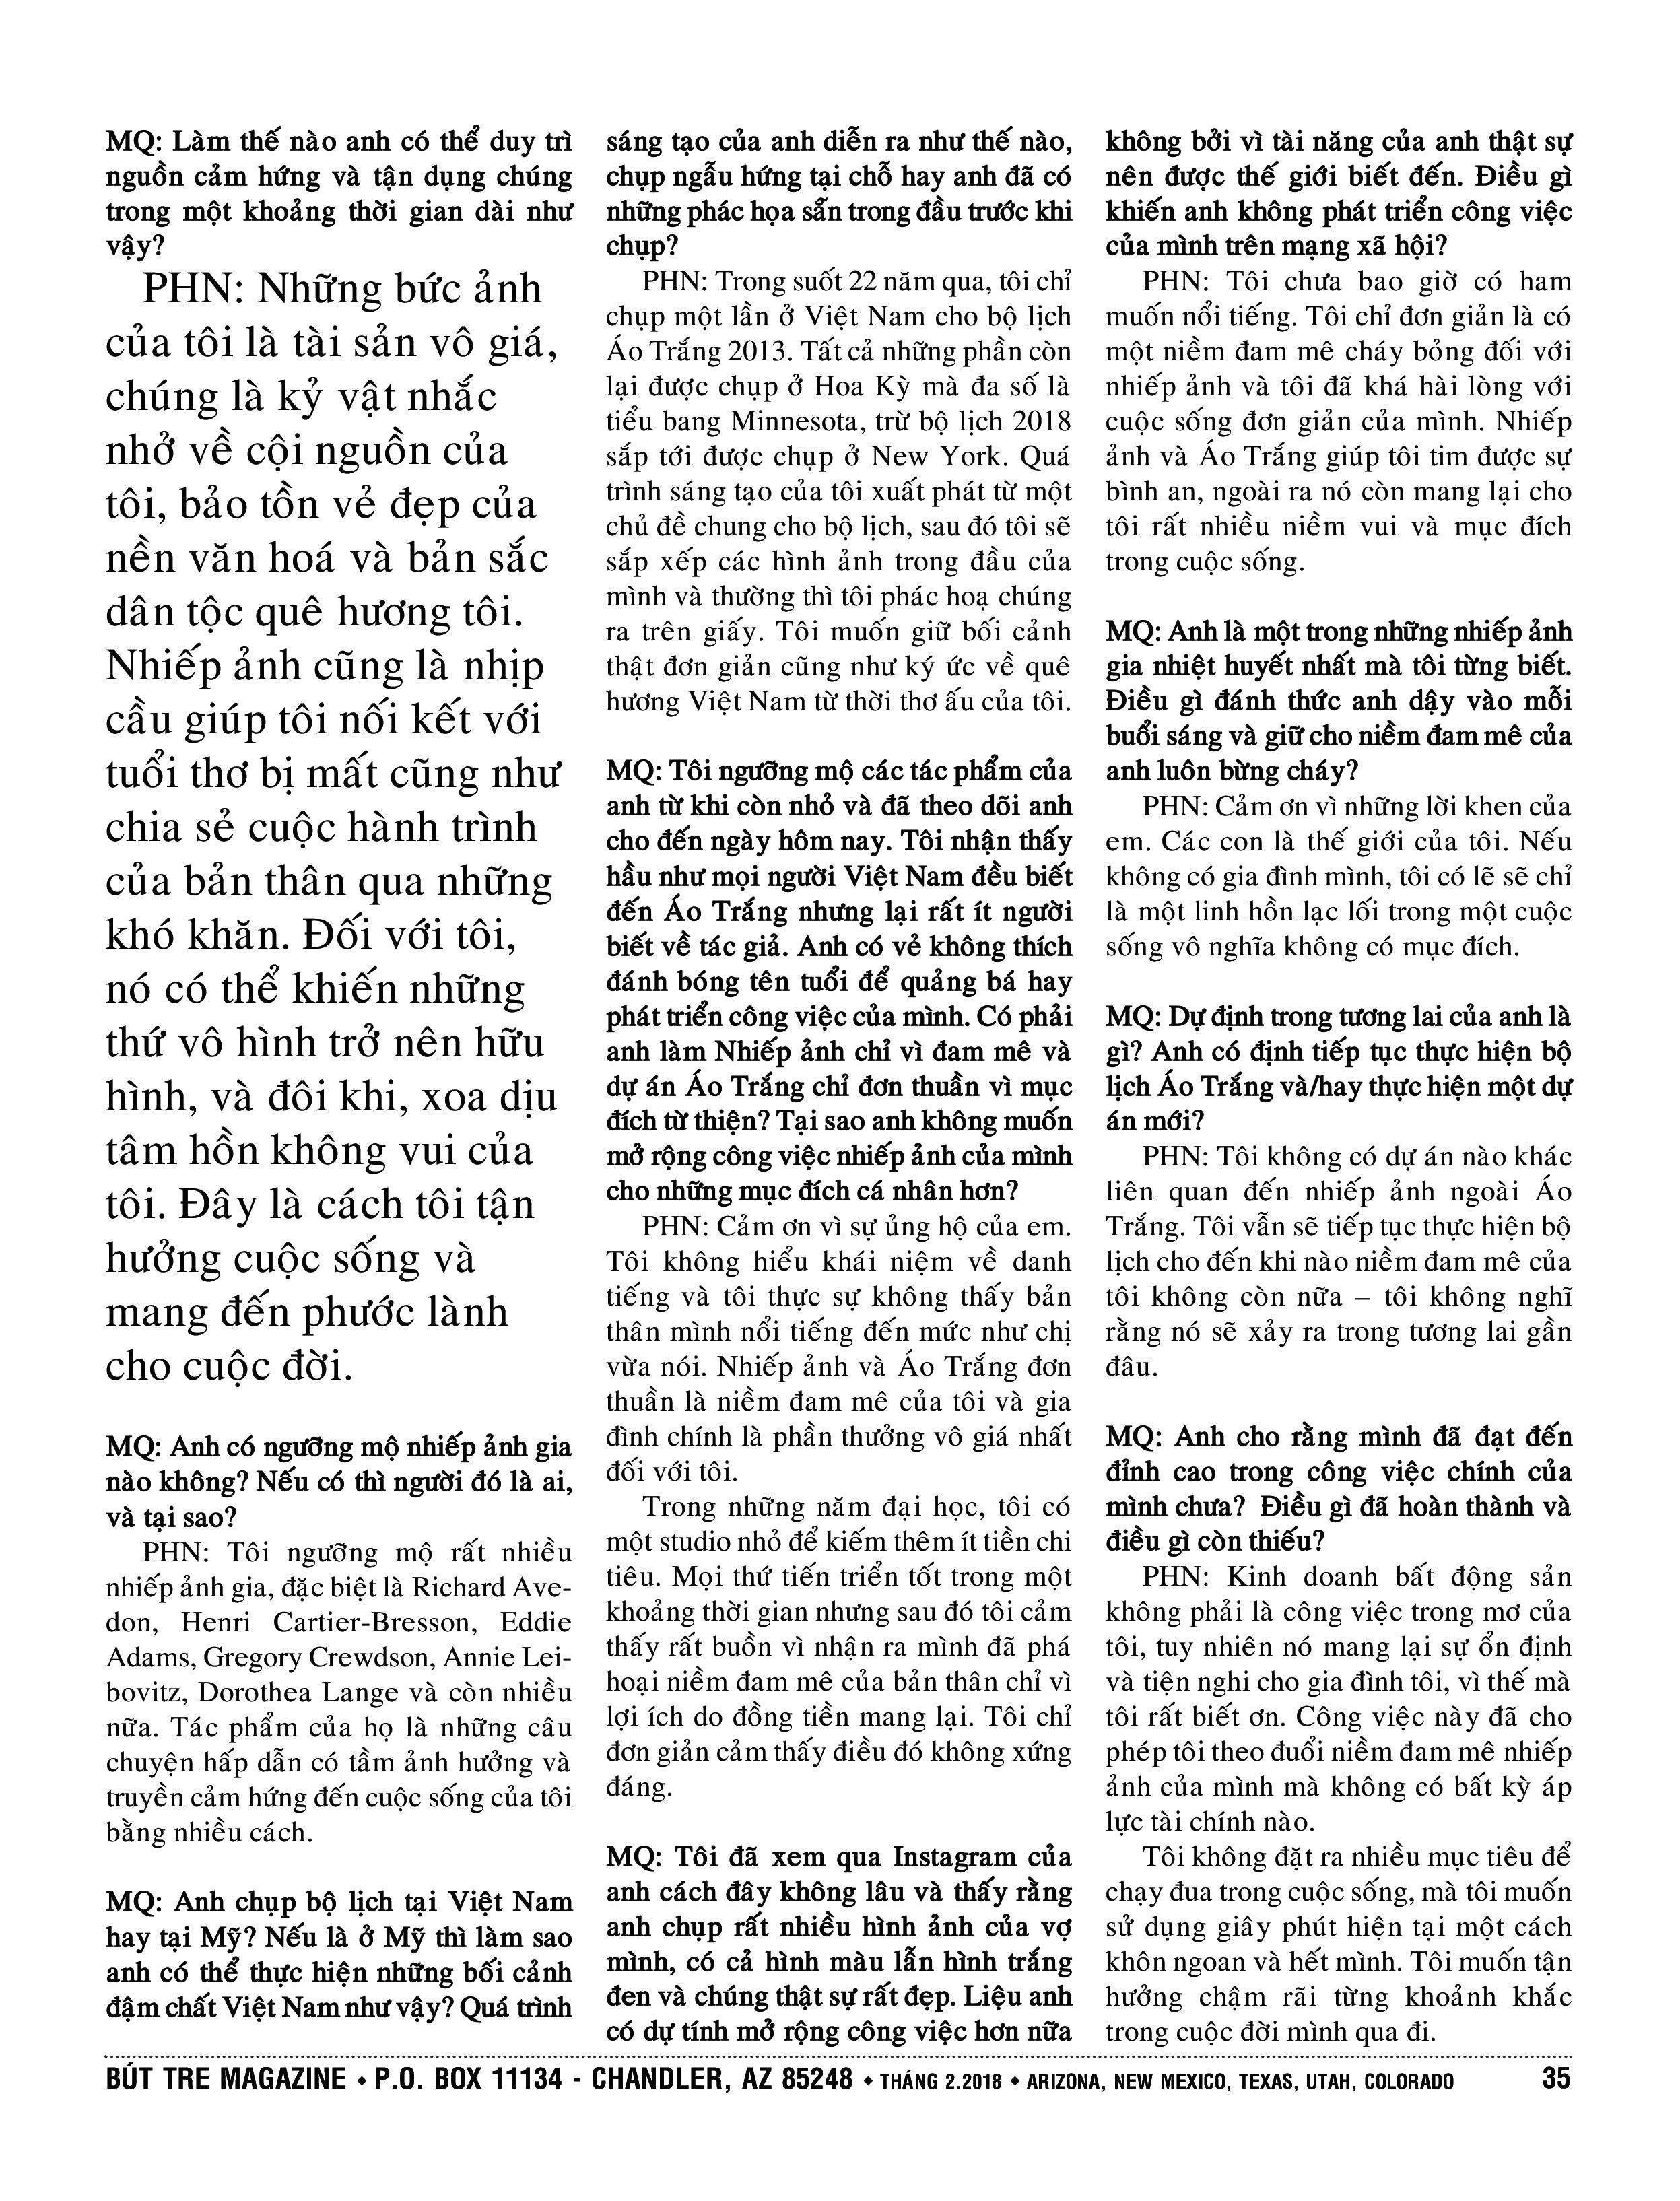 Pham-Hoai-Nam-But-Tre-Interview March 2018-8.jpg